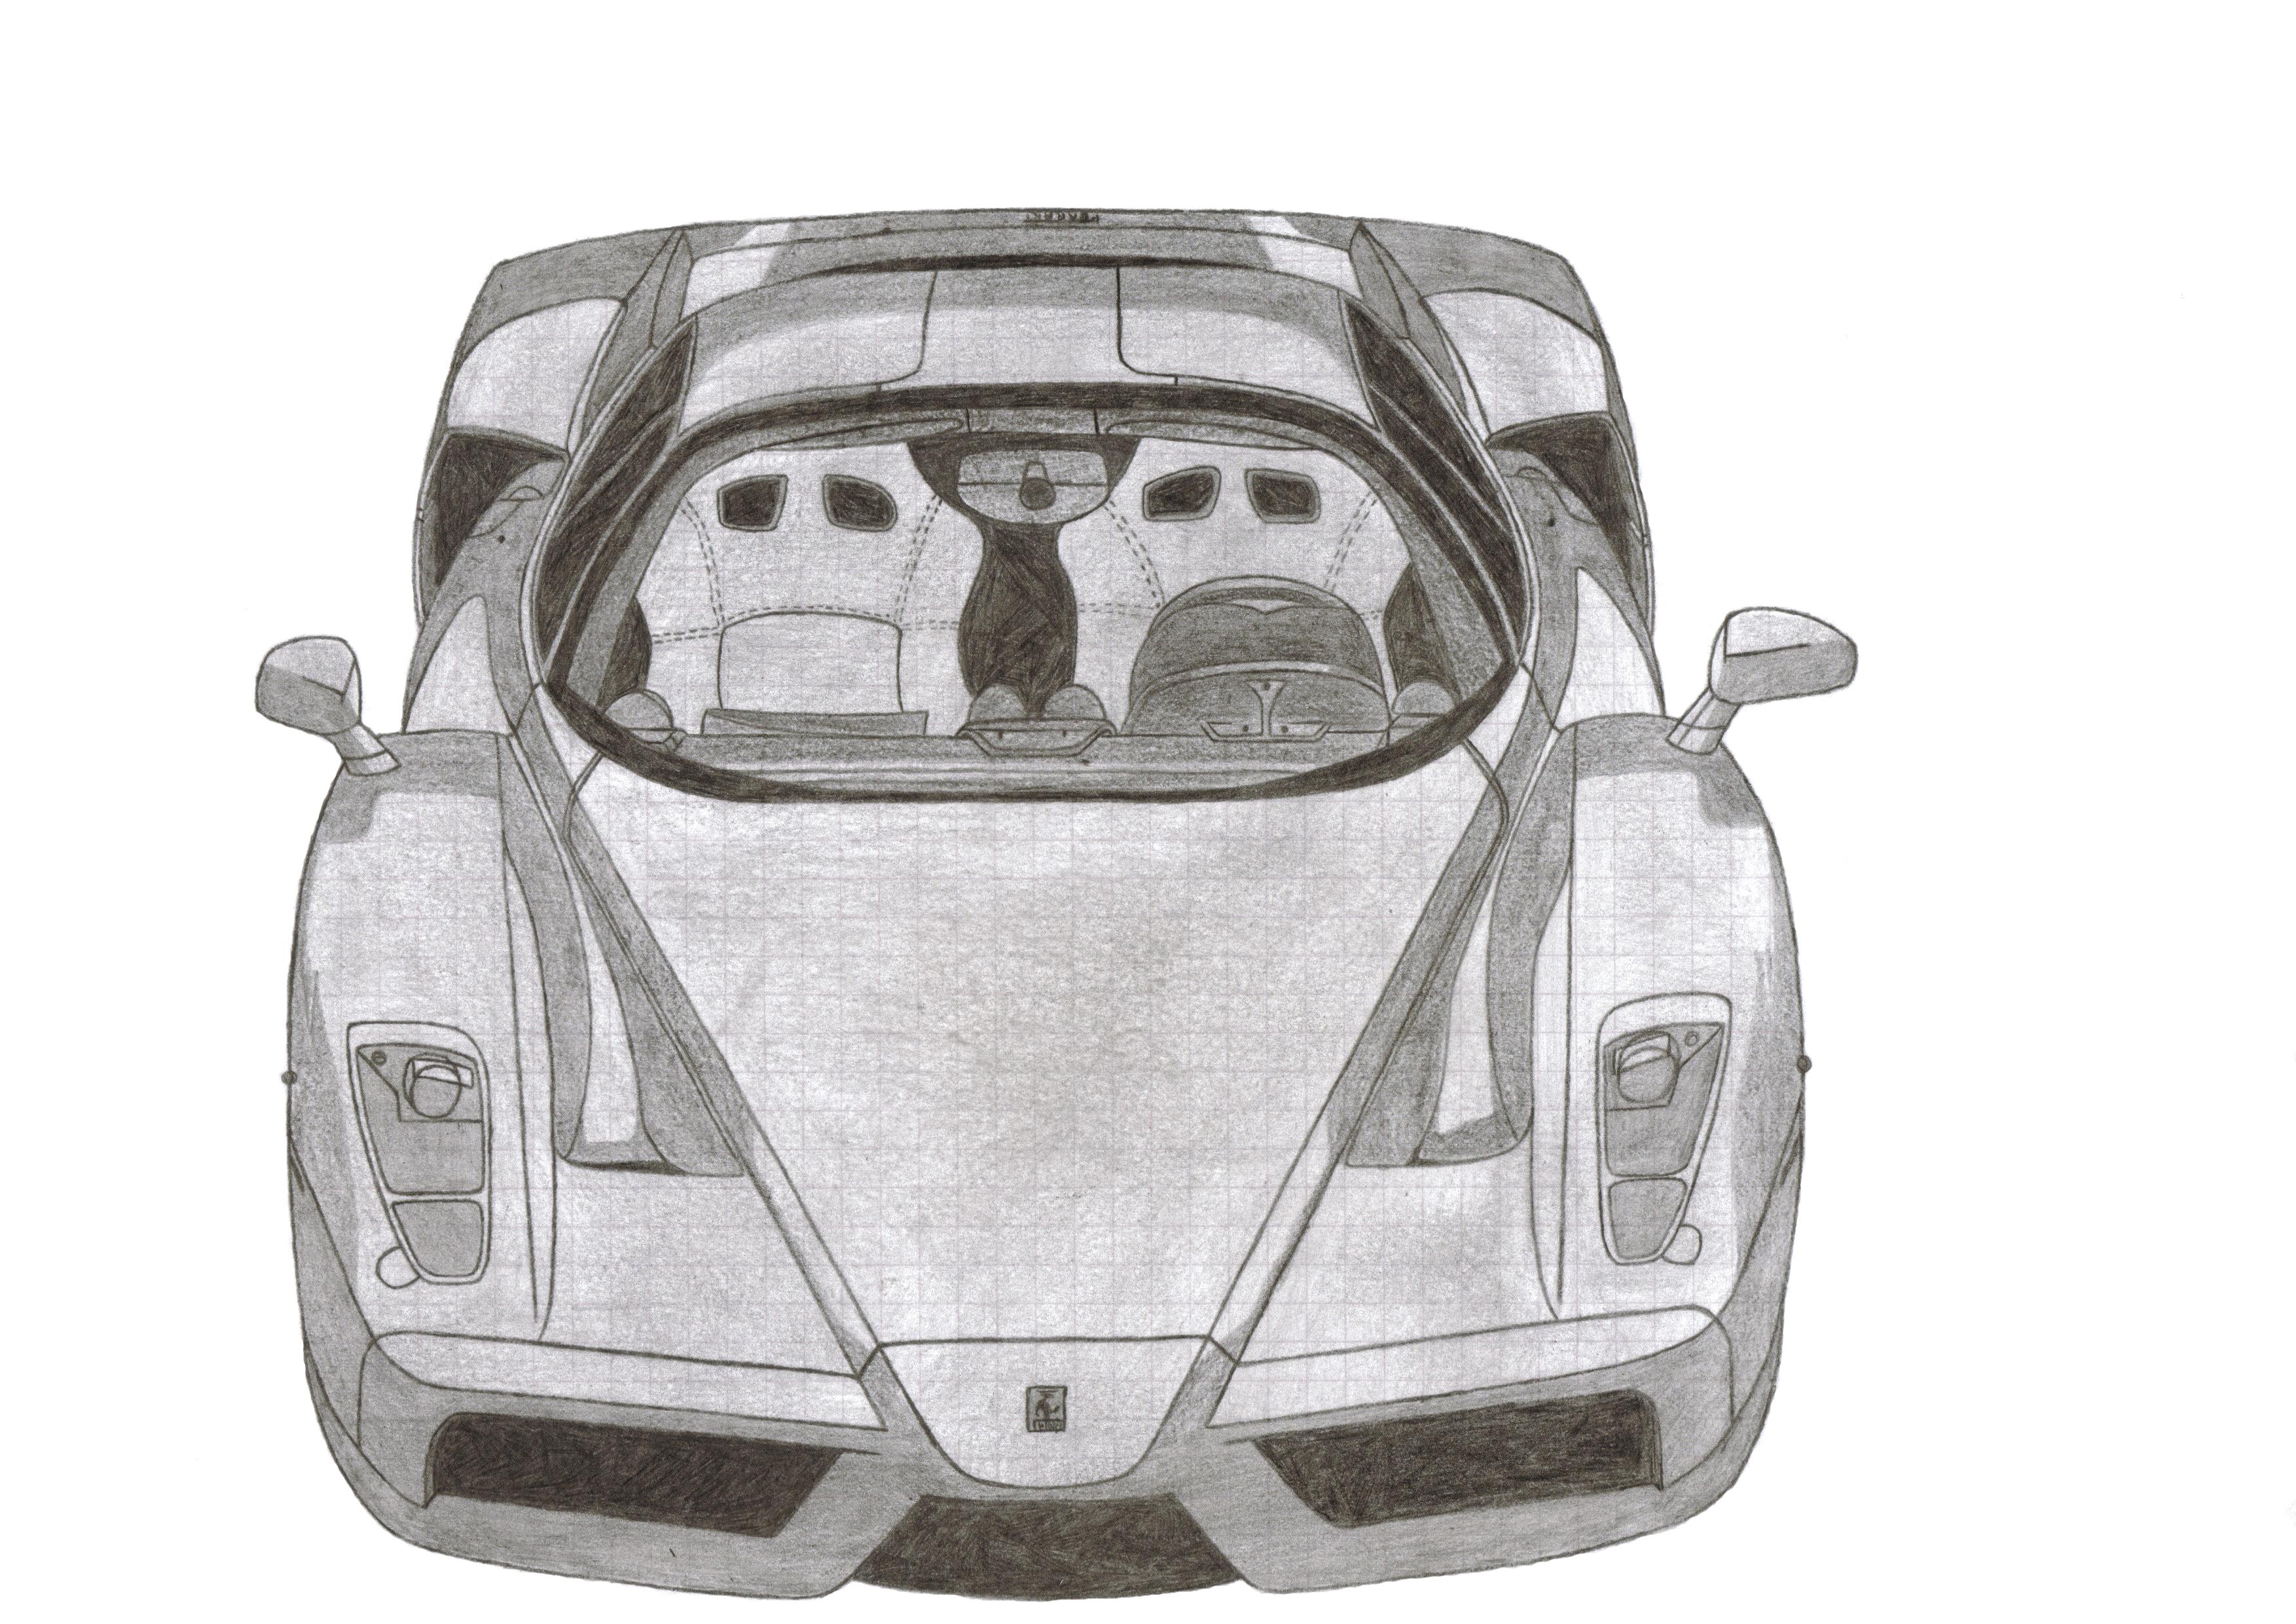 Enzo Ferrari by ManuXIII